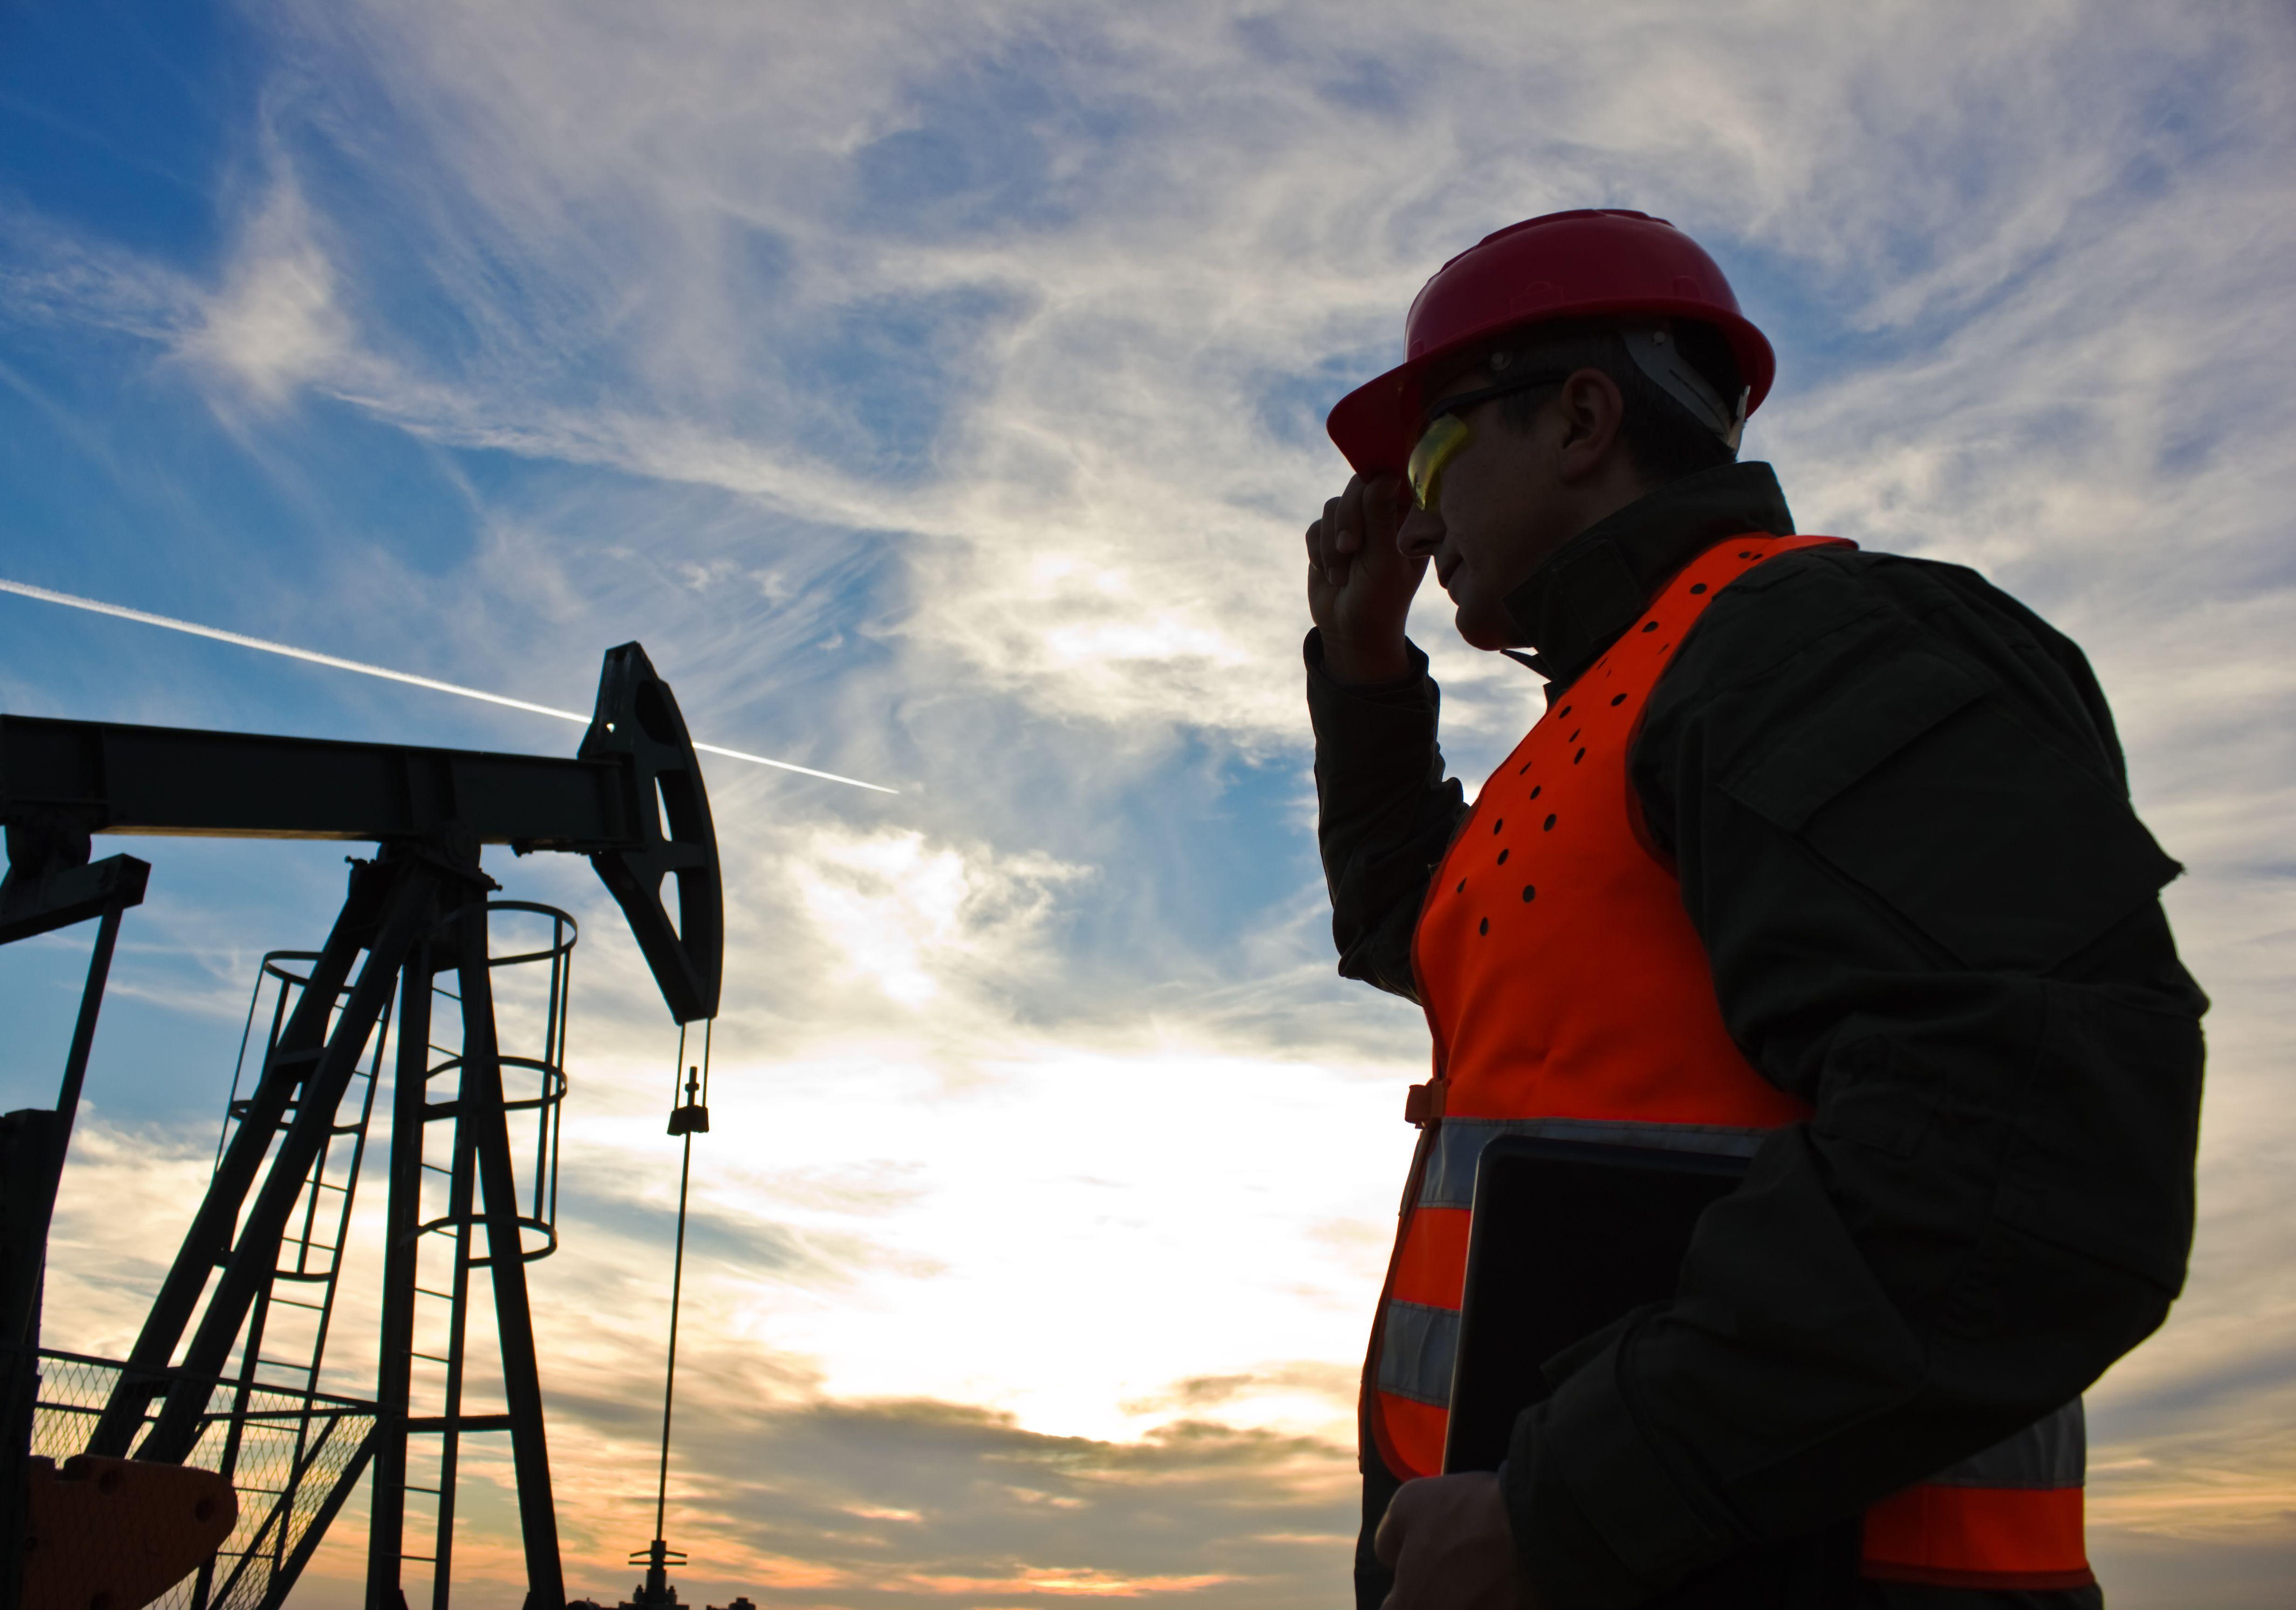 Gas detection oilfield worker